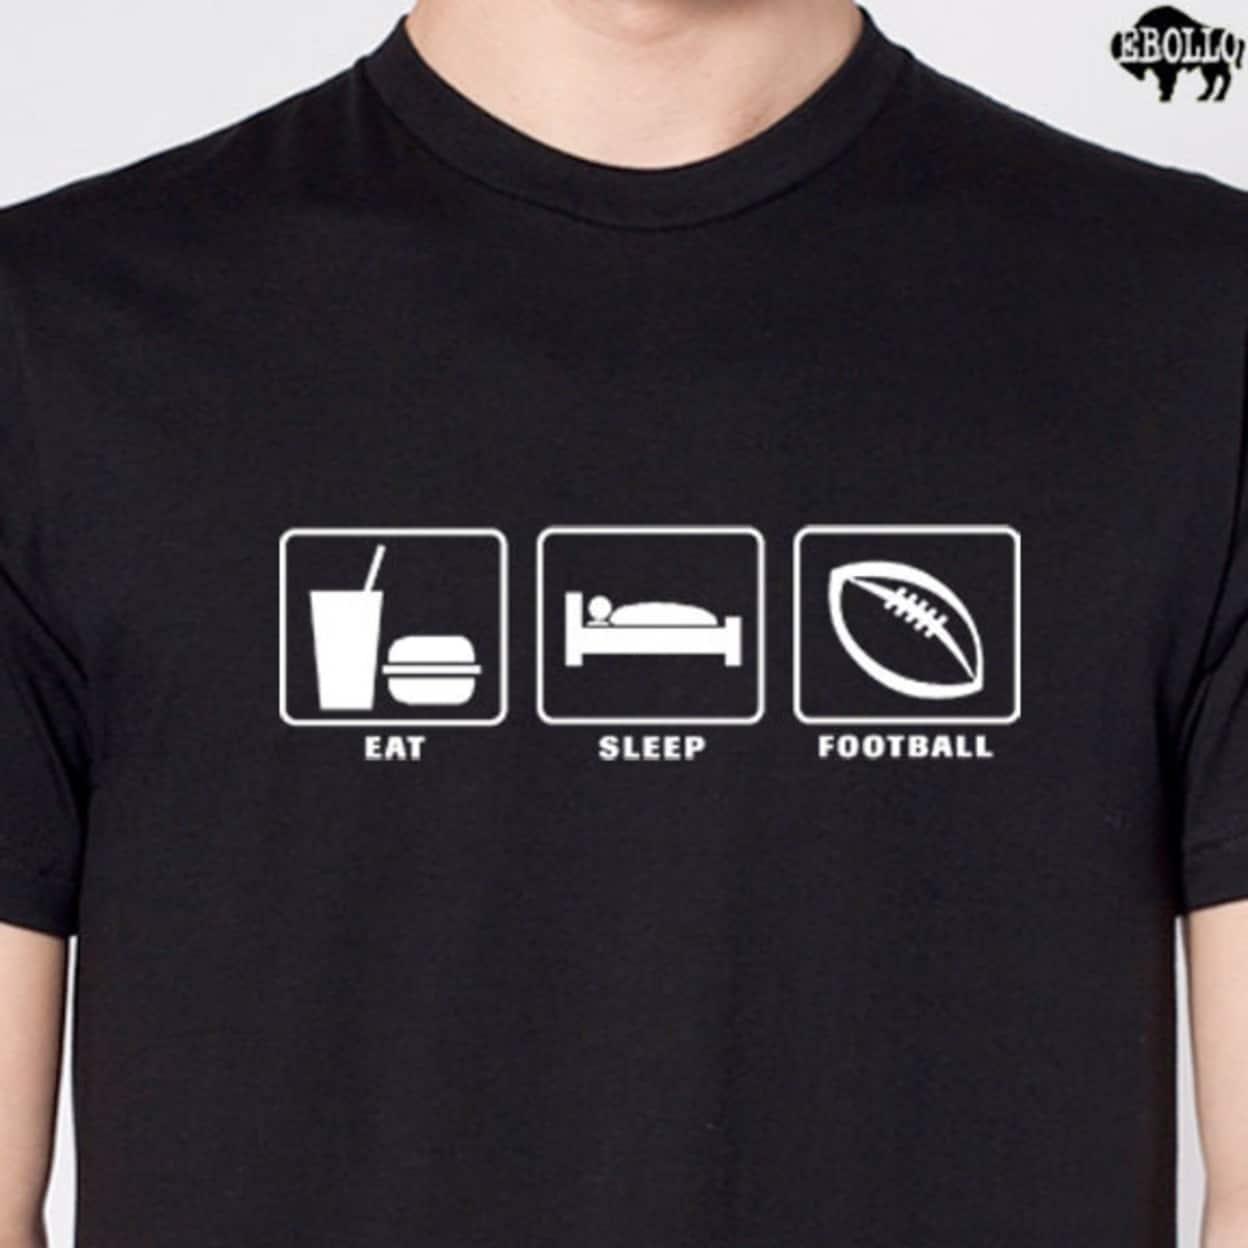 Eat Sleep Football Men\'s Cool T-Shirt Design Funny Tees Sports Tee